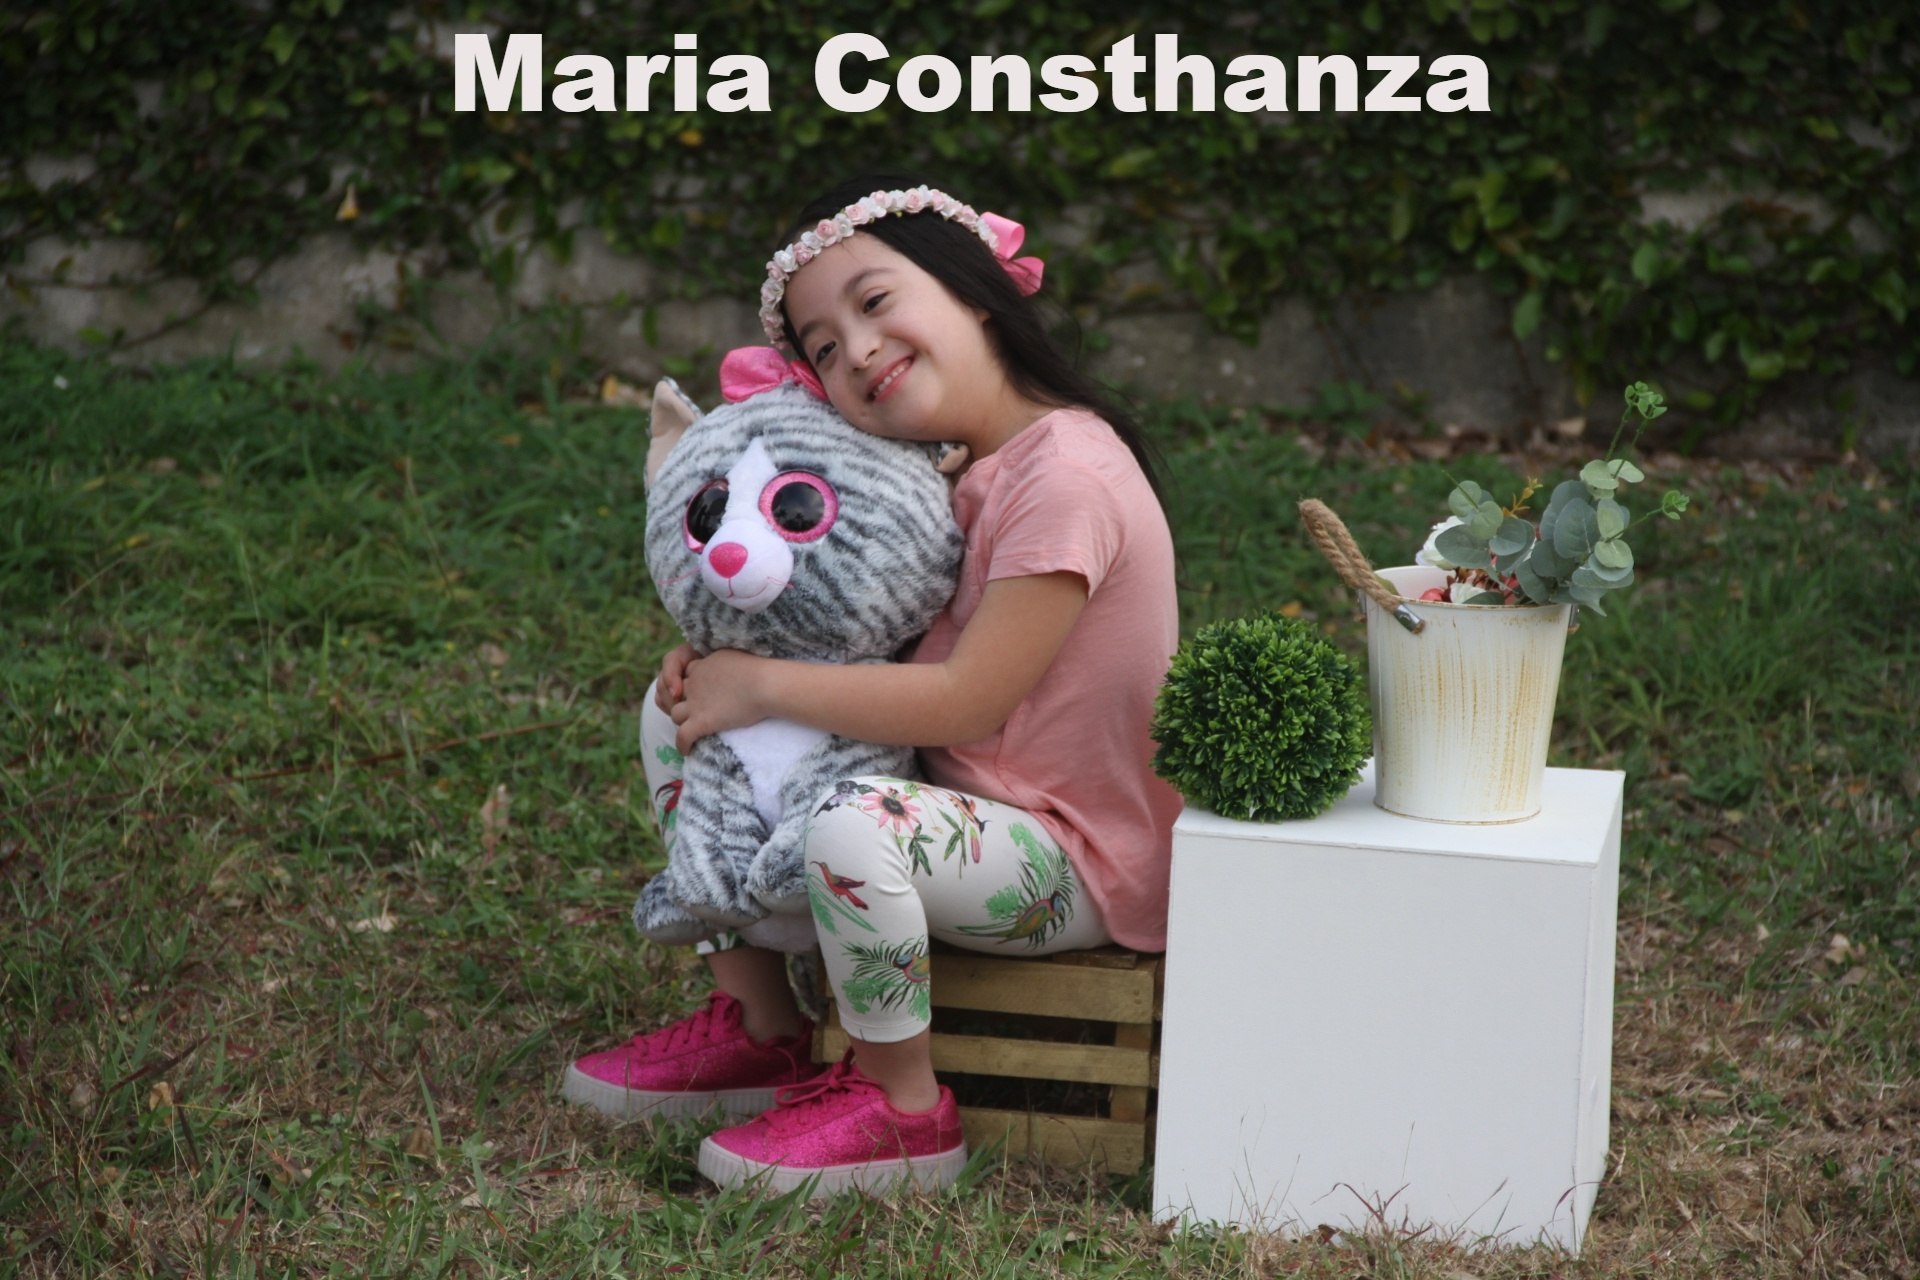 Maria Costhanza